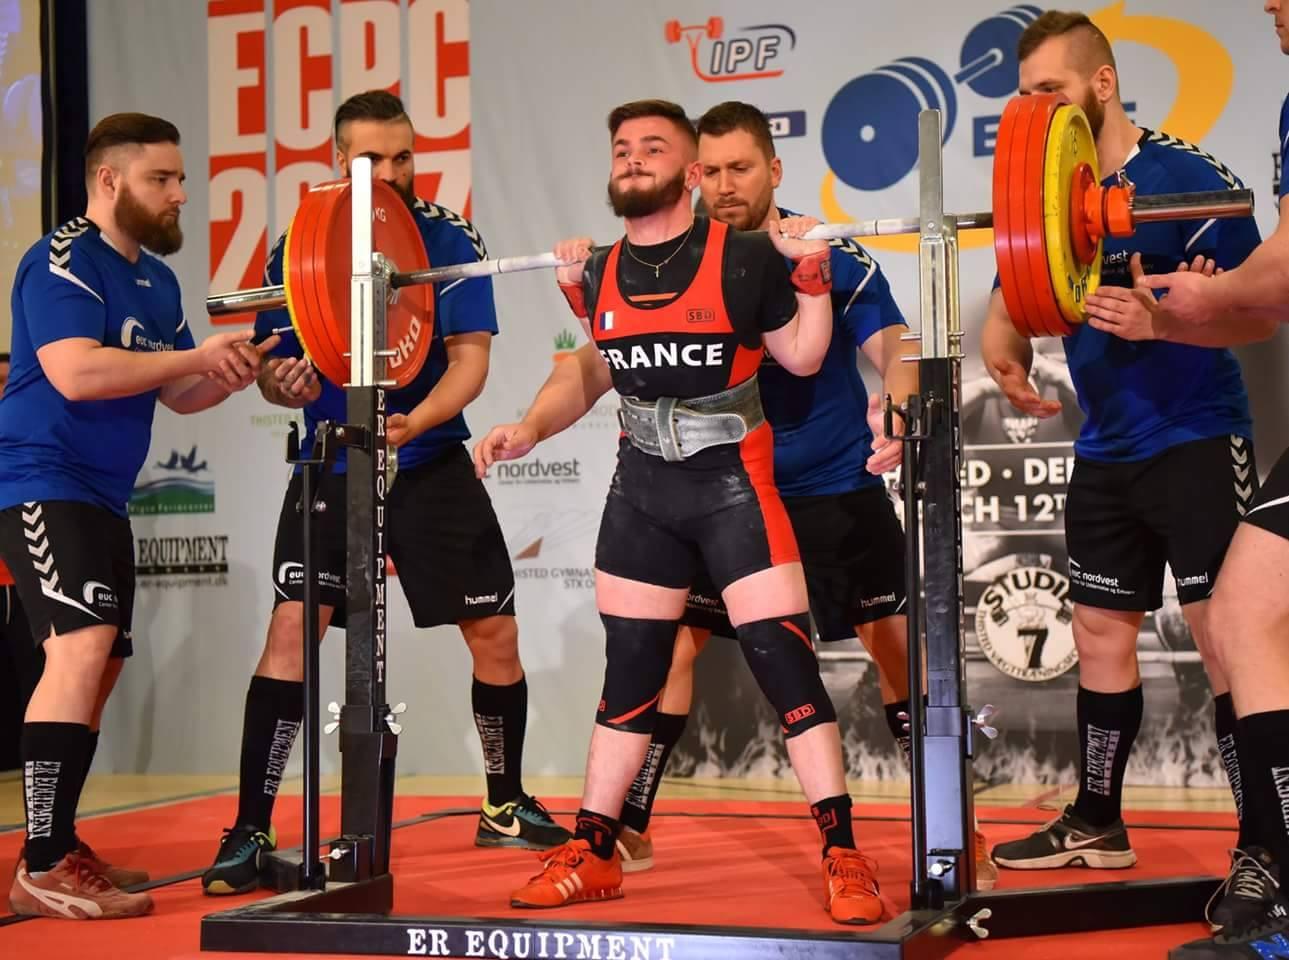 frédéric-mannequin-squat-ipf-europe-epf-force-athlétique